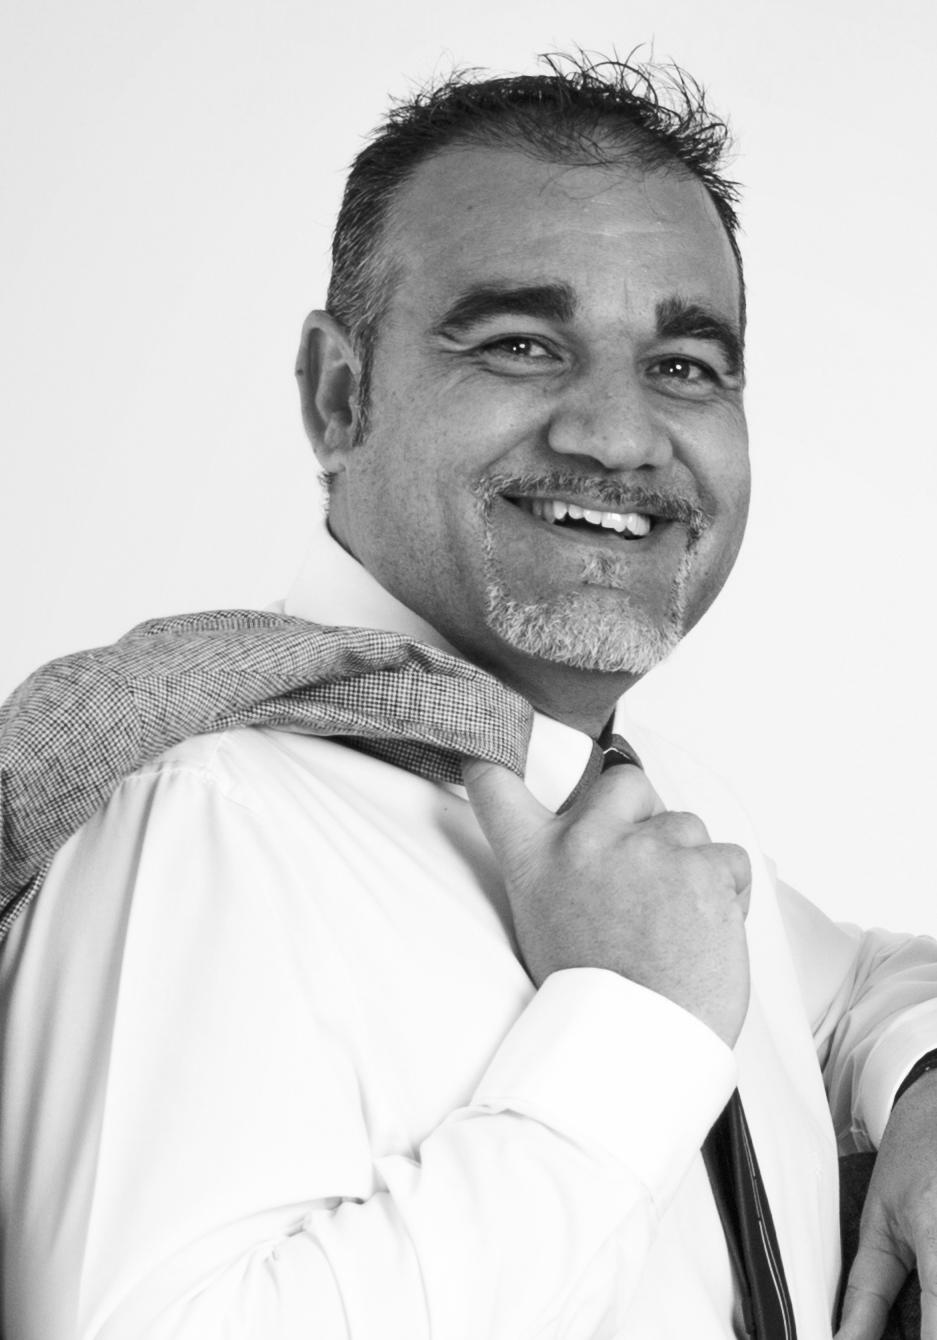 Miguel Angel Ortega